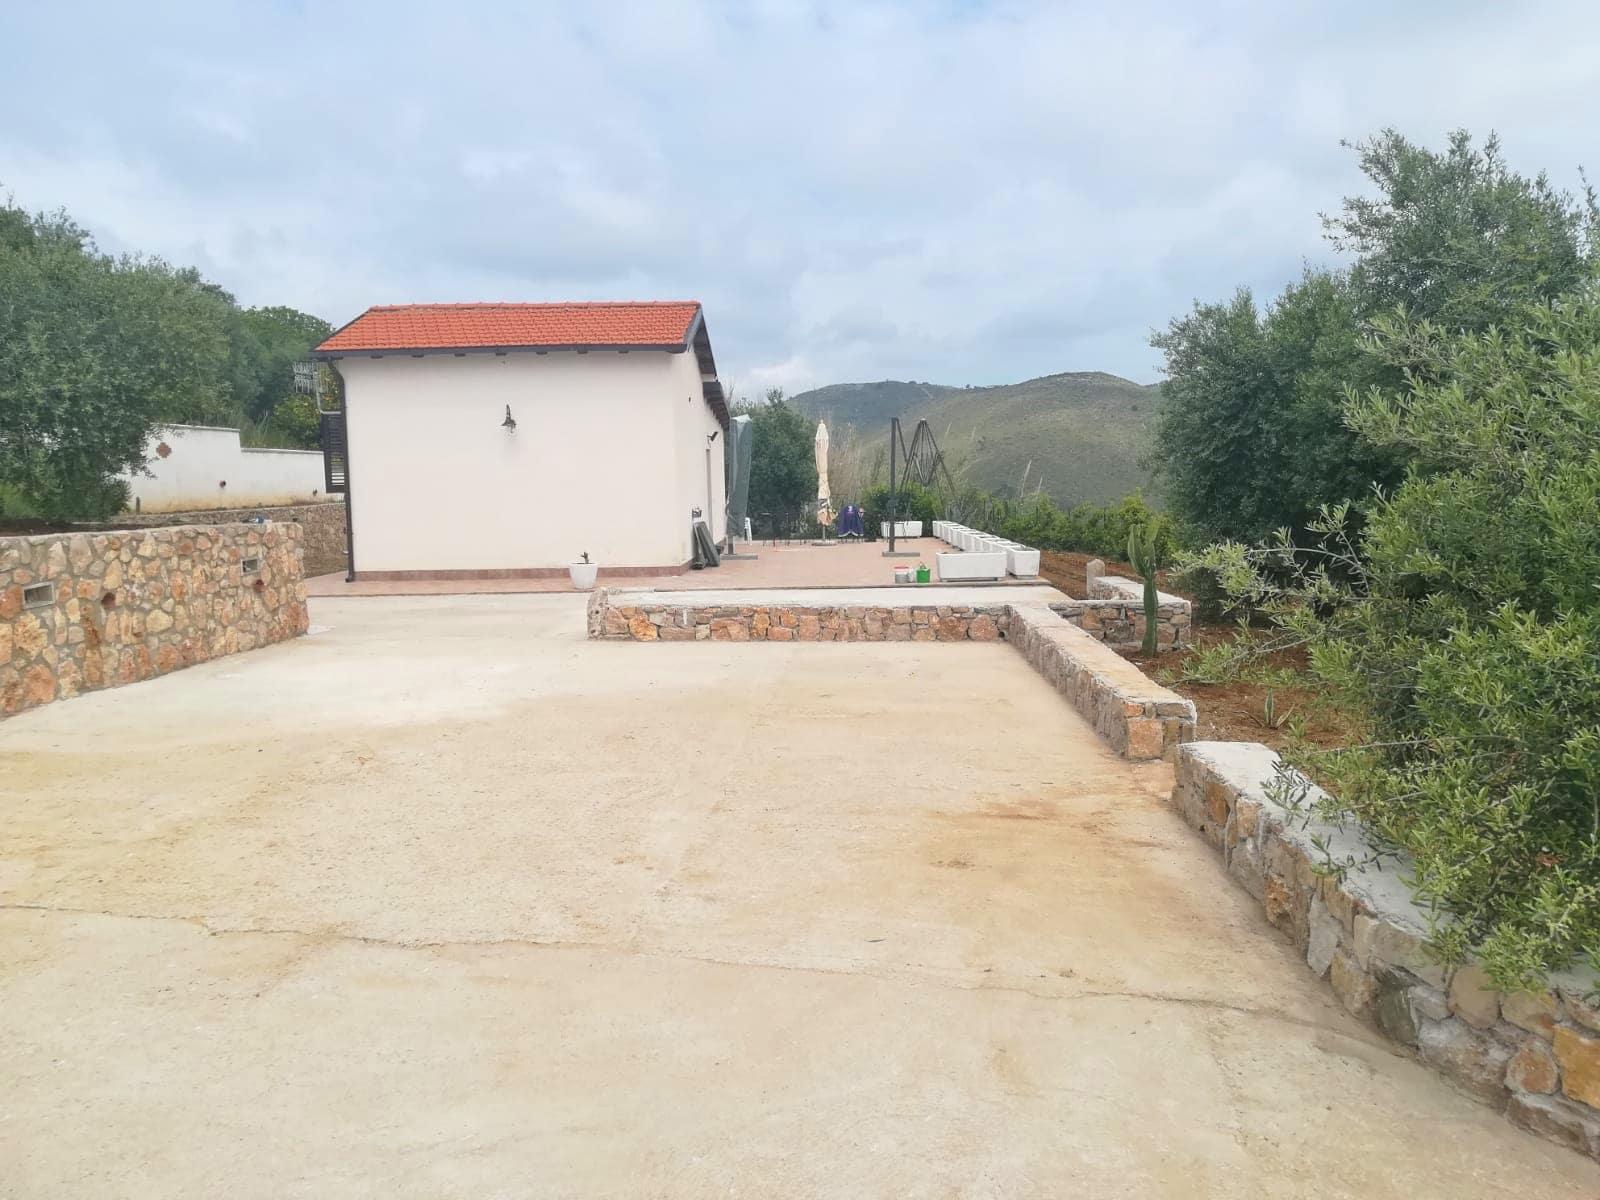 Terreno in vendita a Gaeta